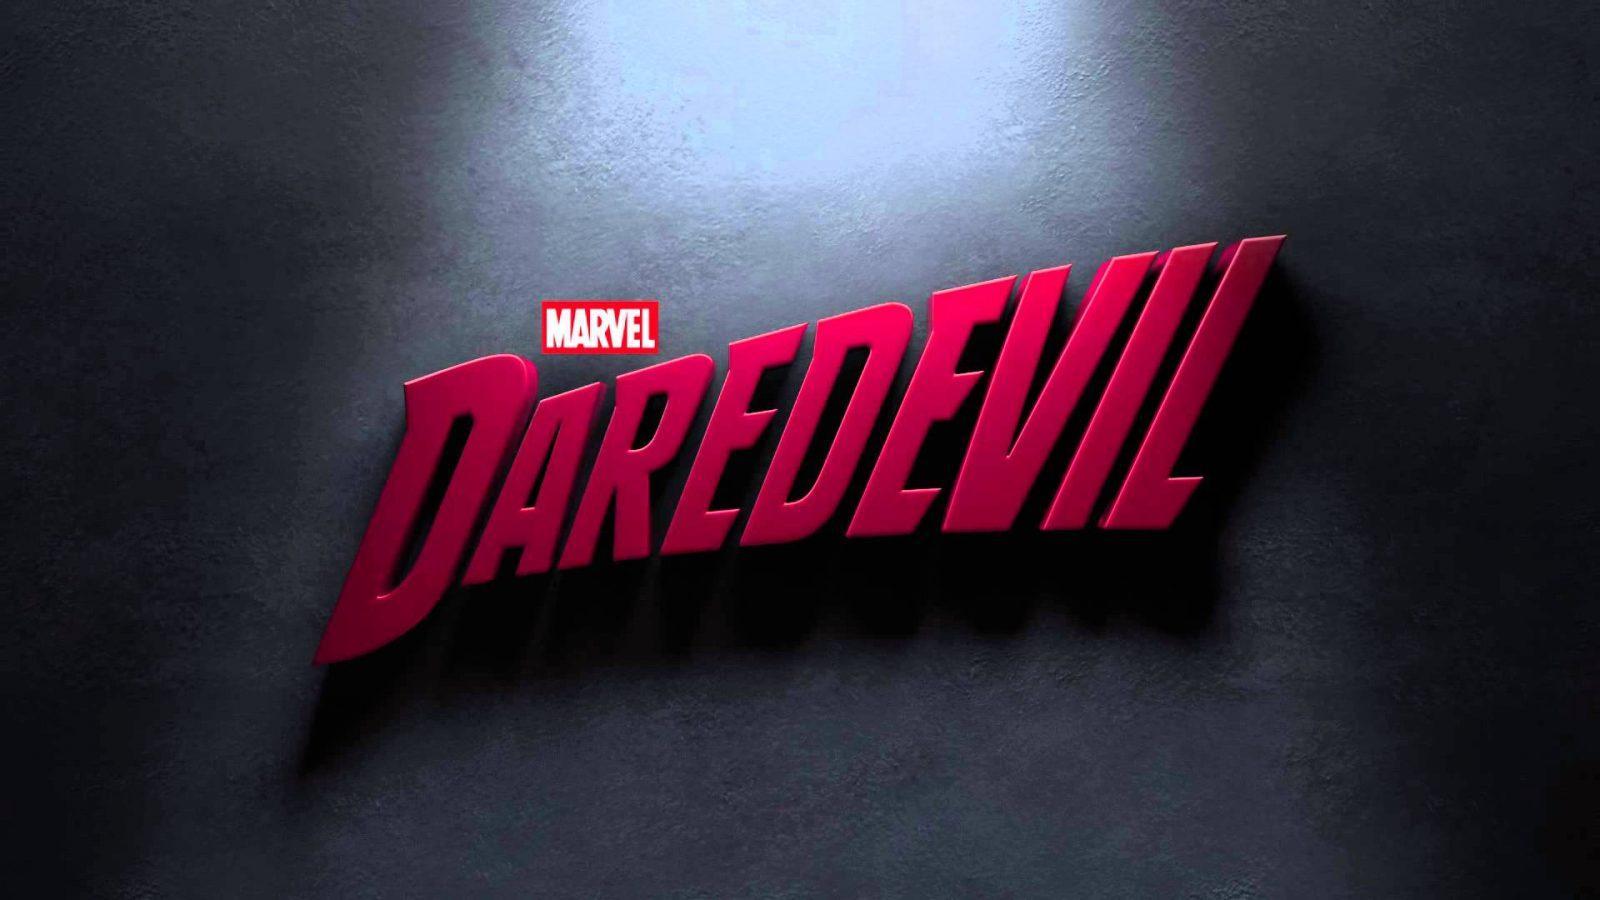 Netflix's Daredevil Season 1 Review - The 13-Hour Movie